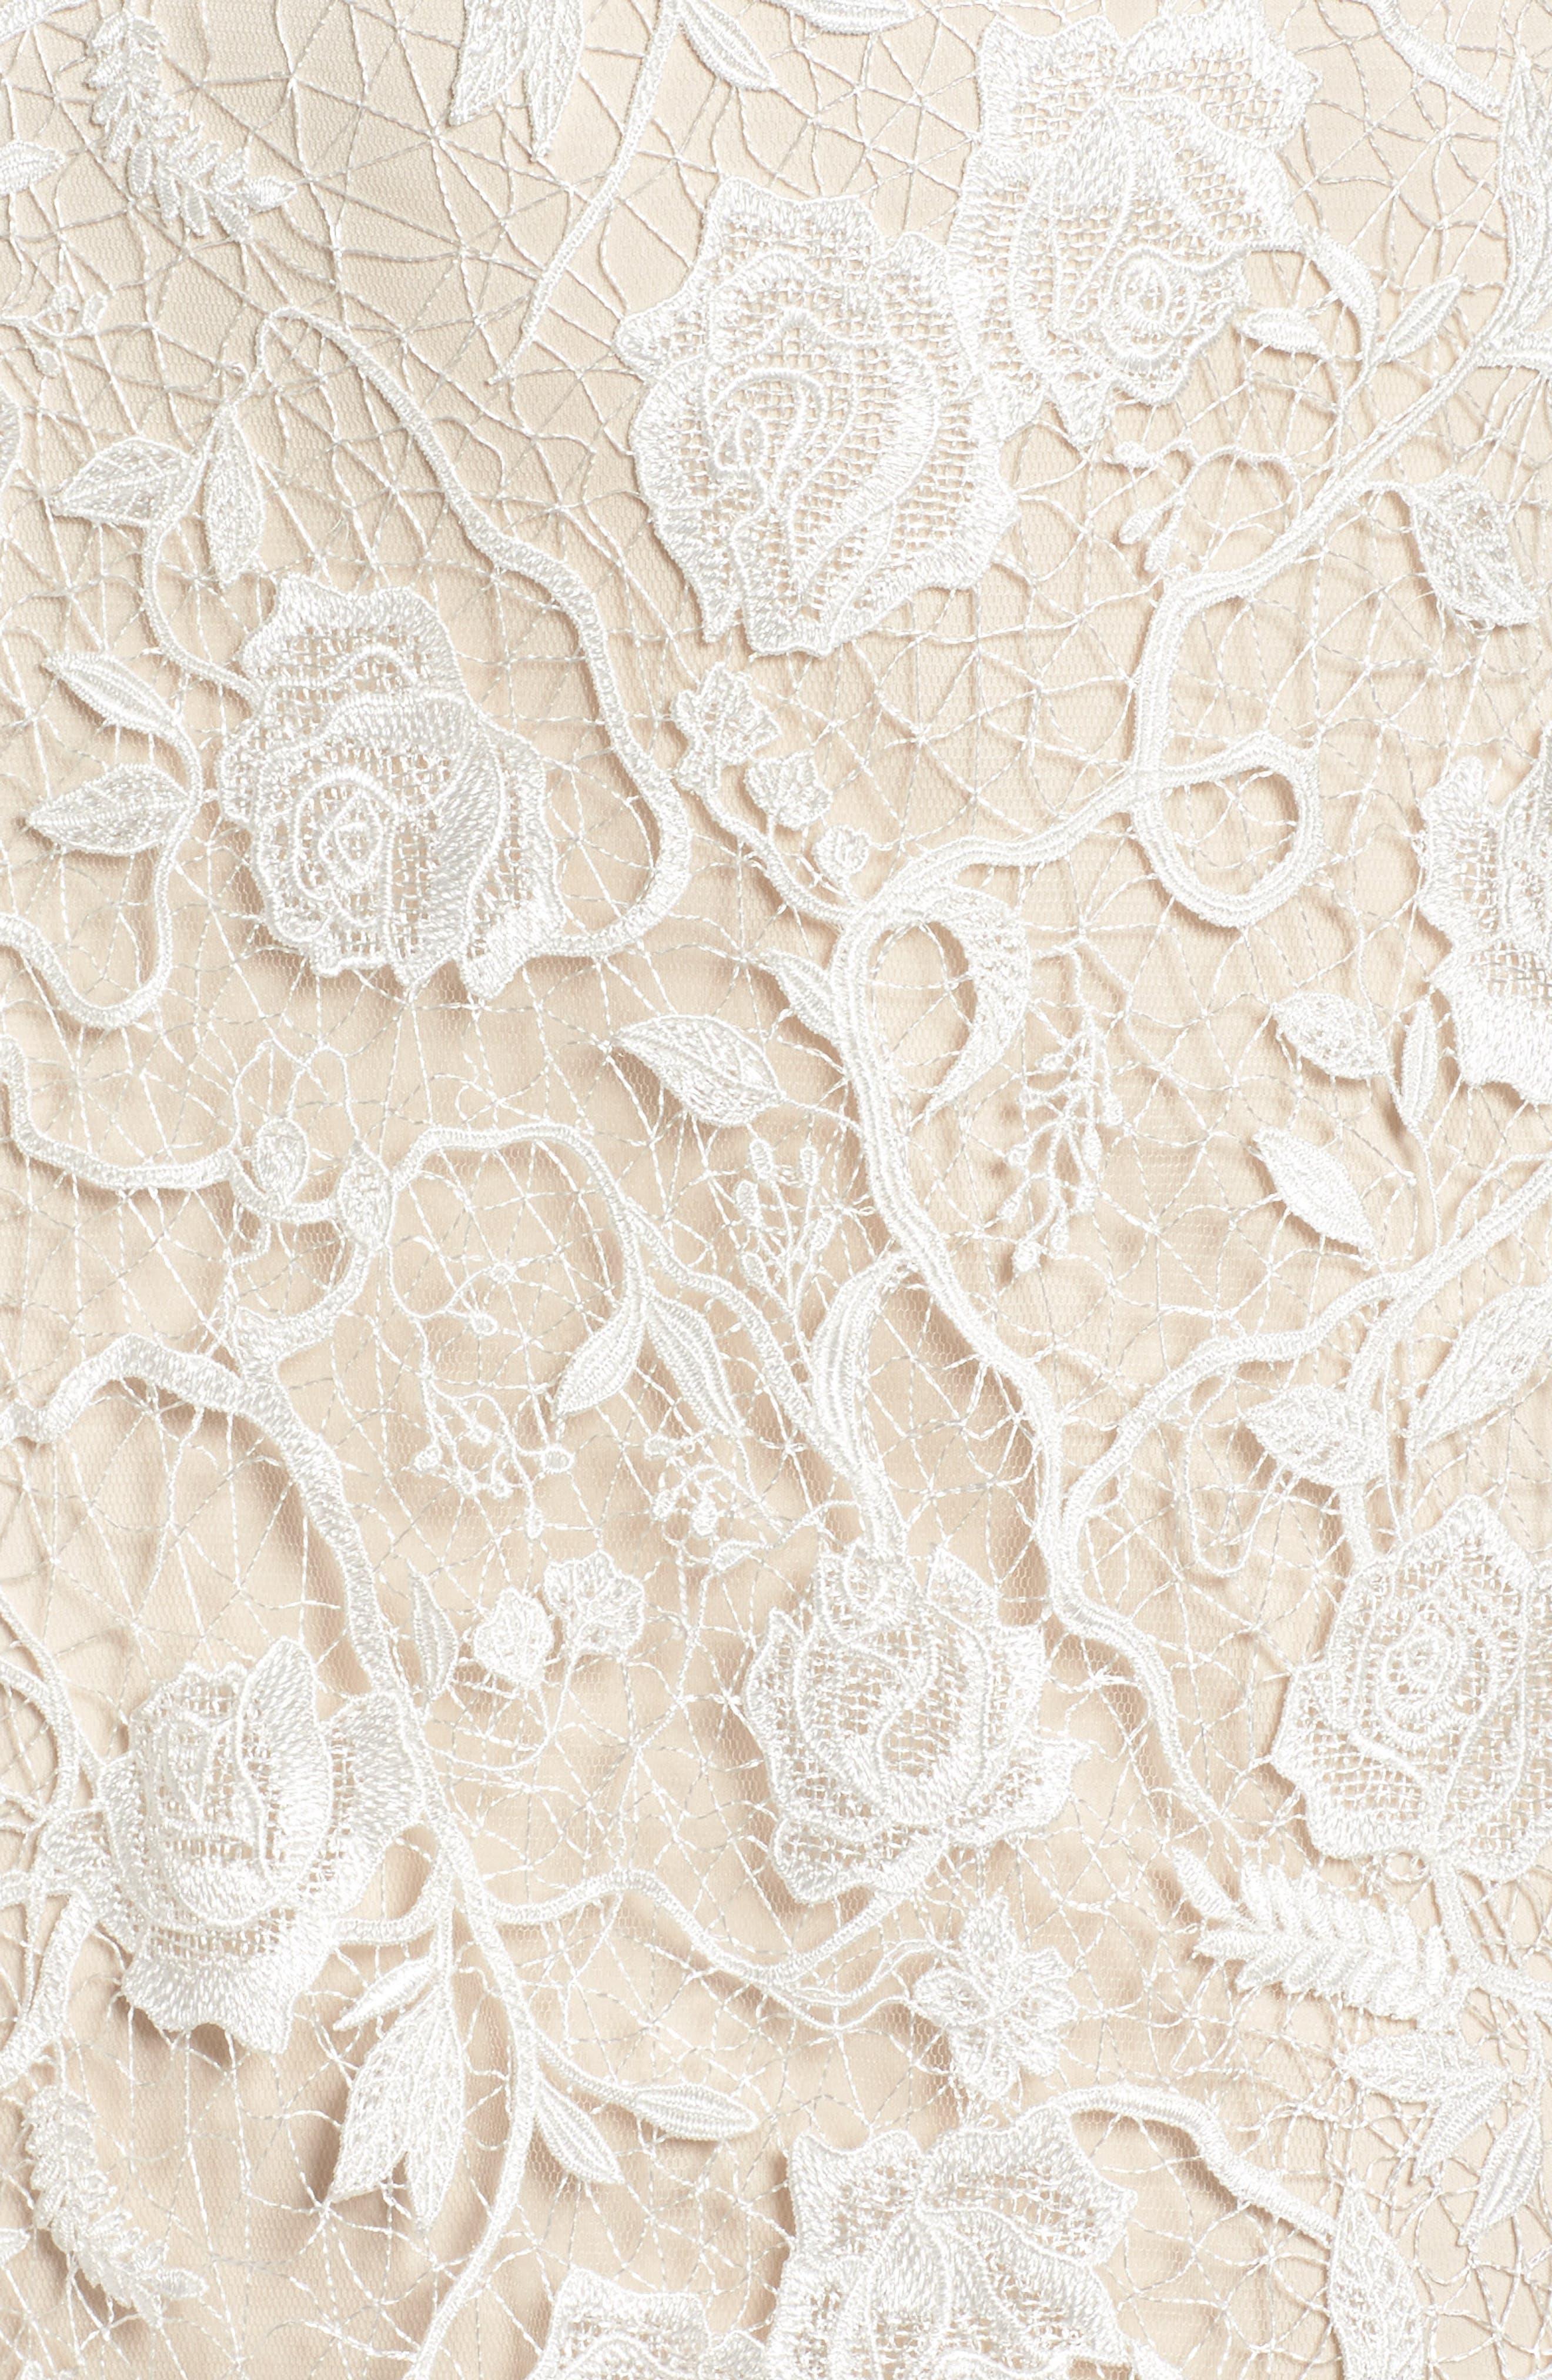 Long Sleeve A-Line Sheath Gown,                             Alternate thumbnail 6, color,                             IVORY/ PETAL